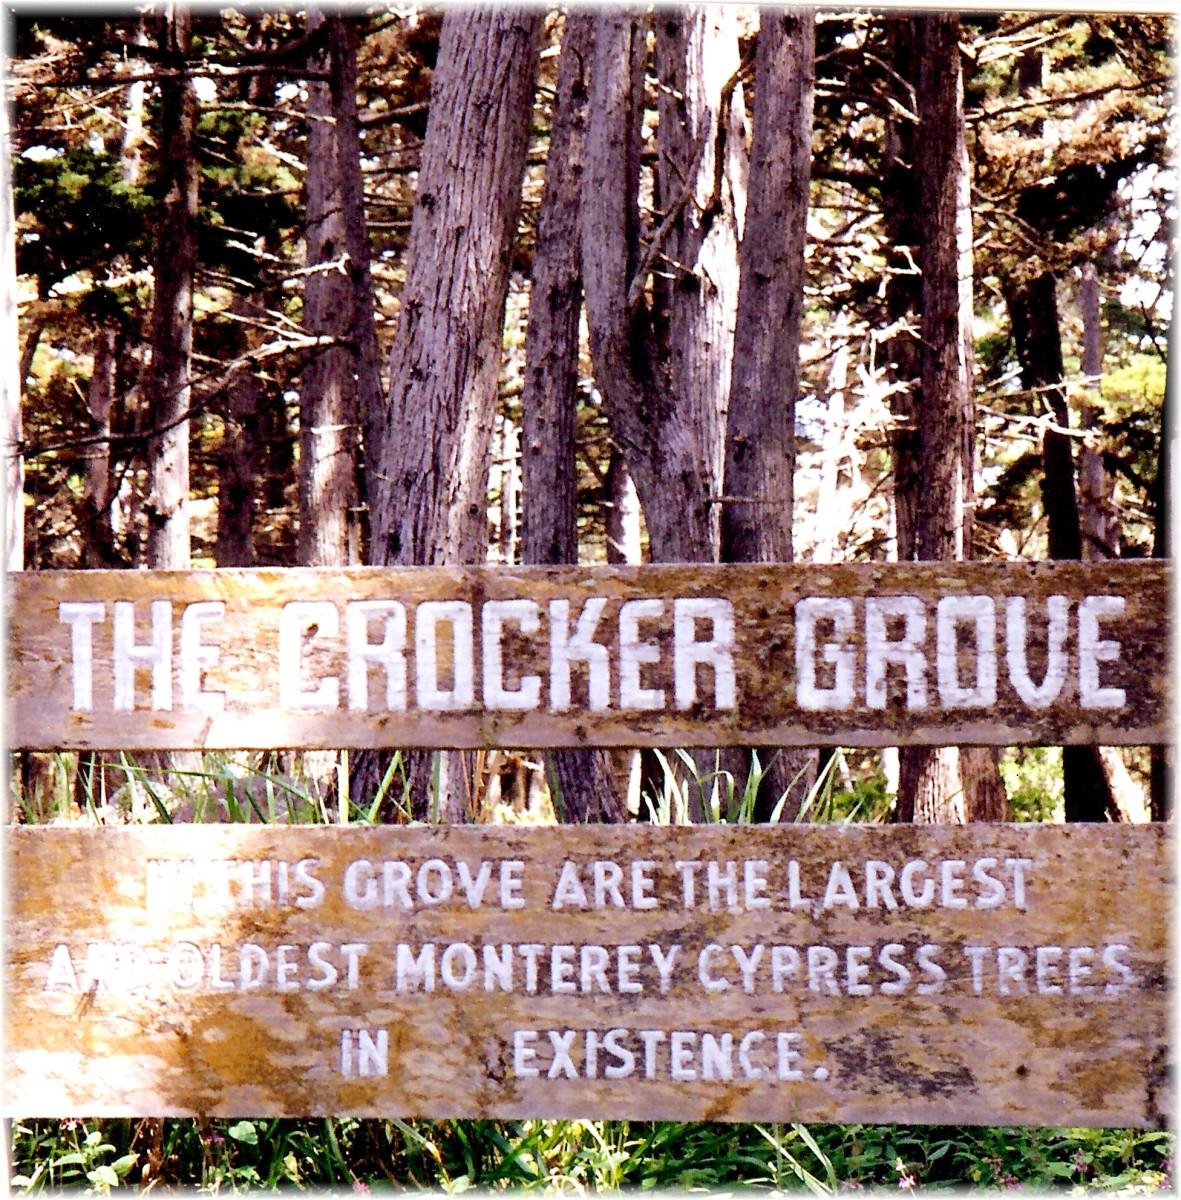 Crocker Grover sign